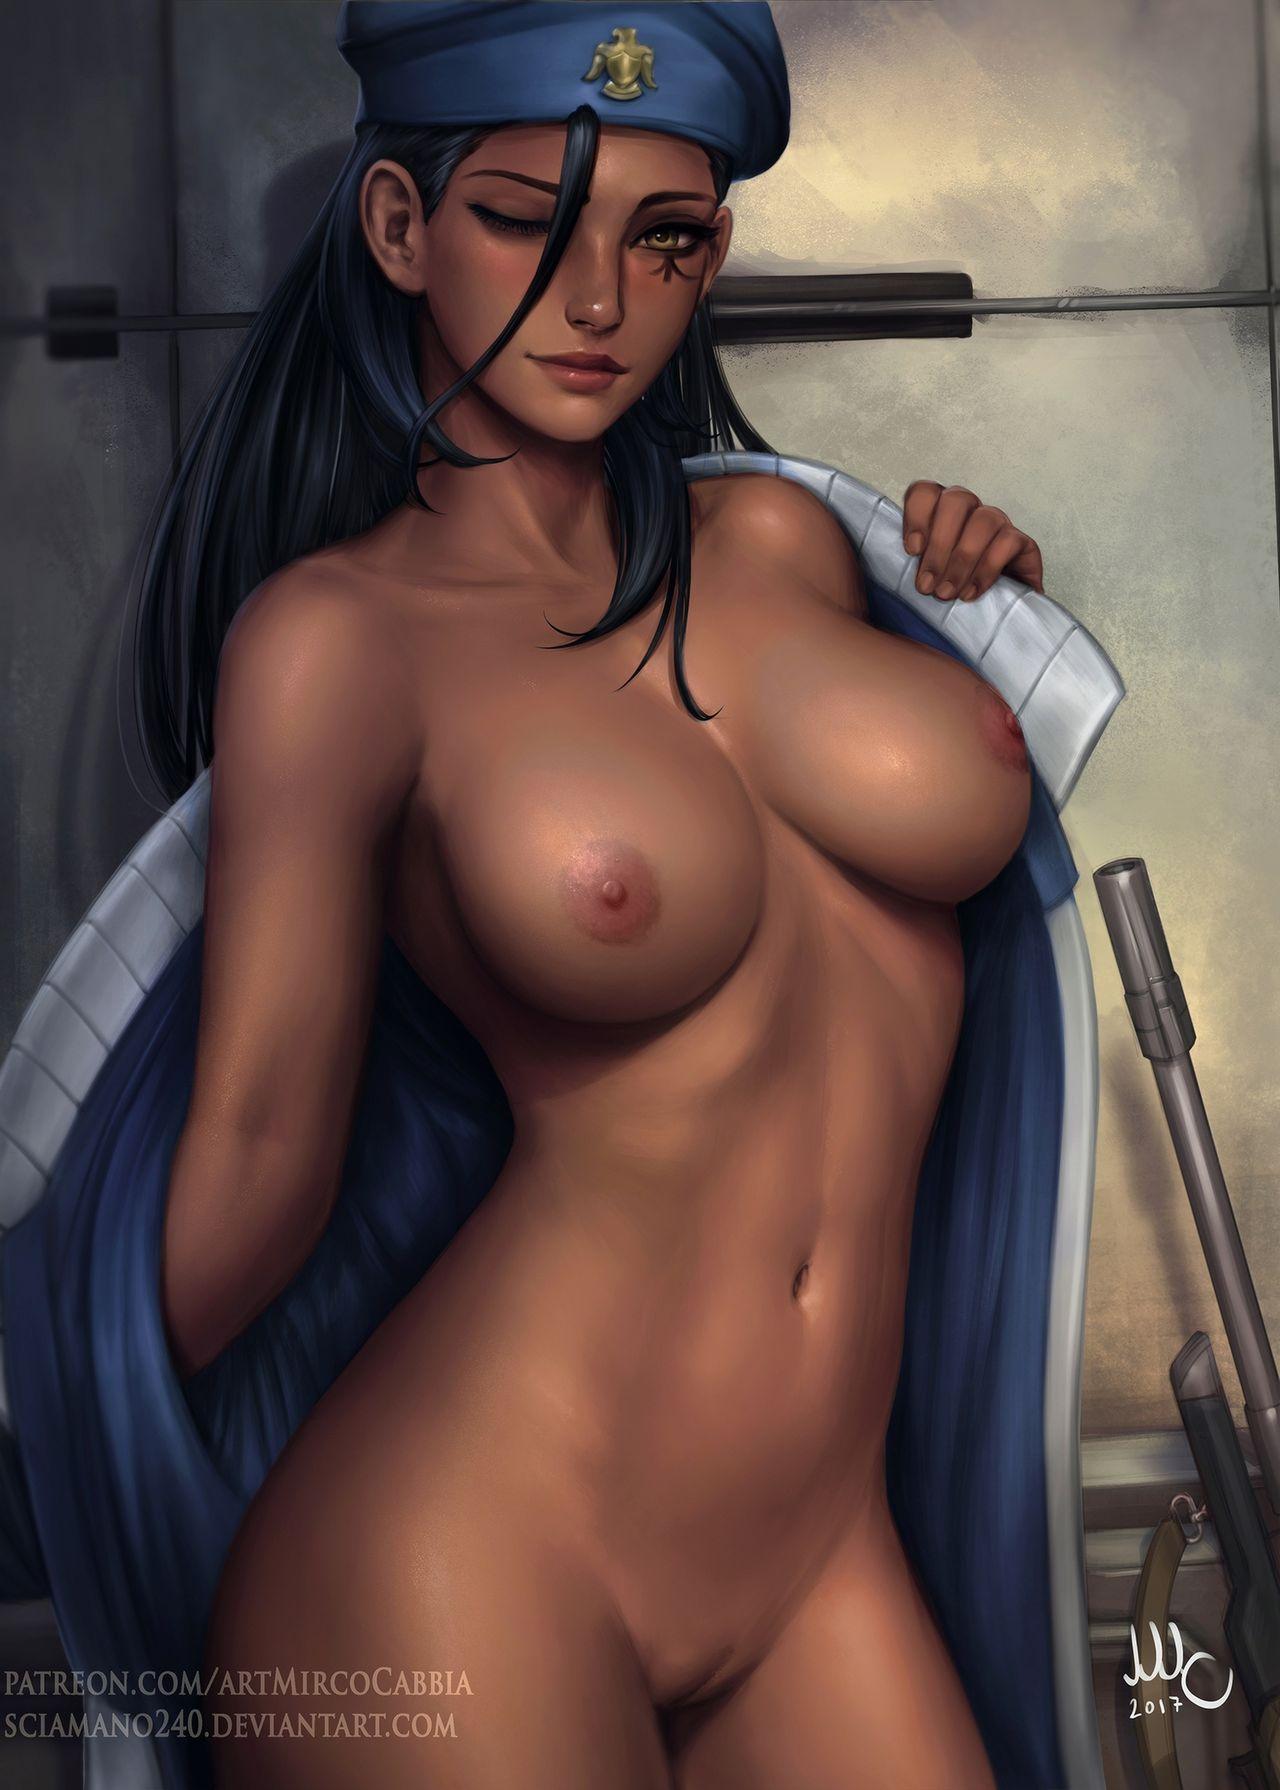 3771697 - Ana_Amari Overlook Sciamano240